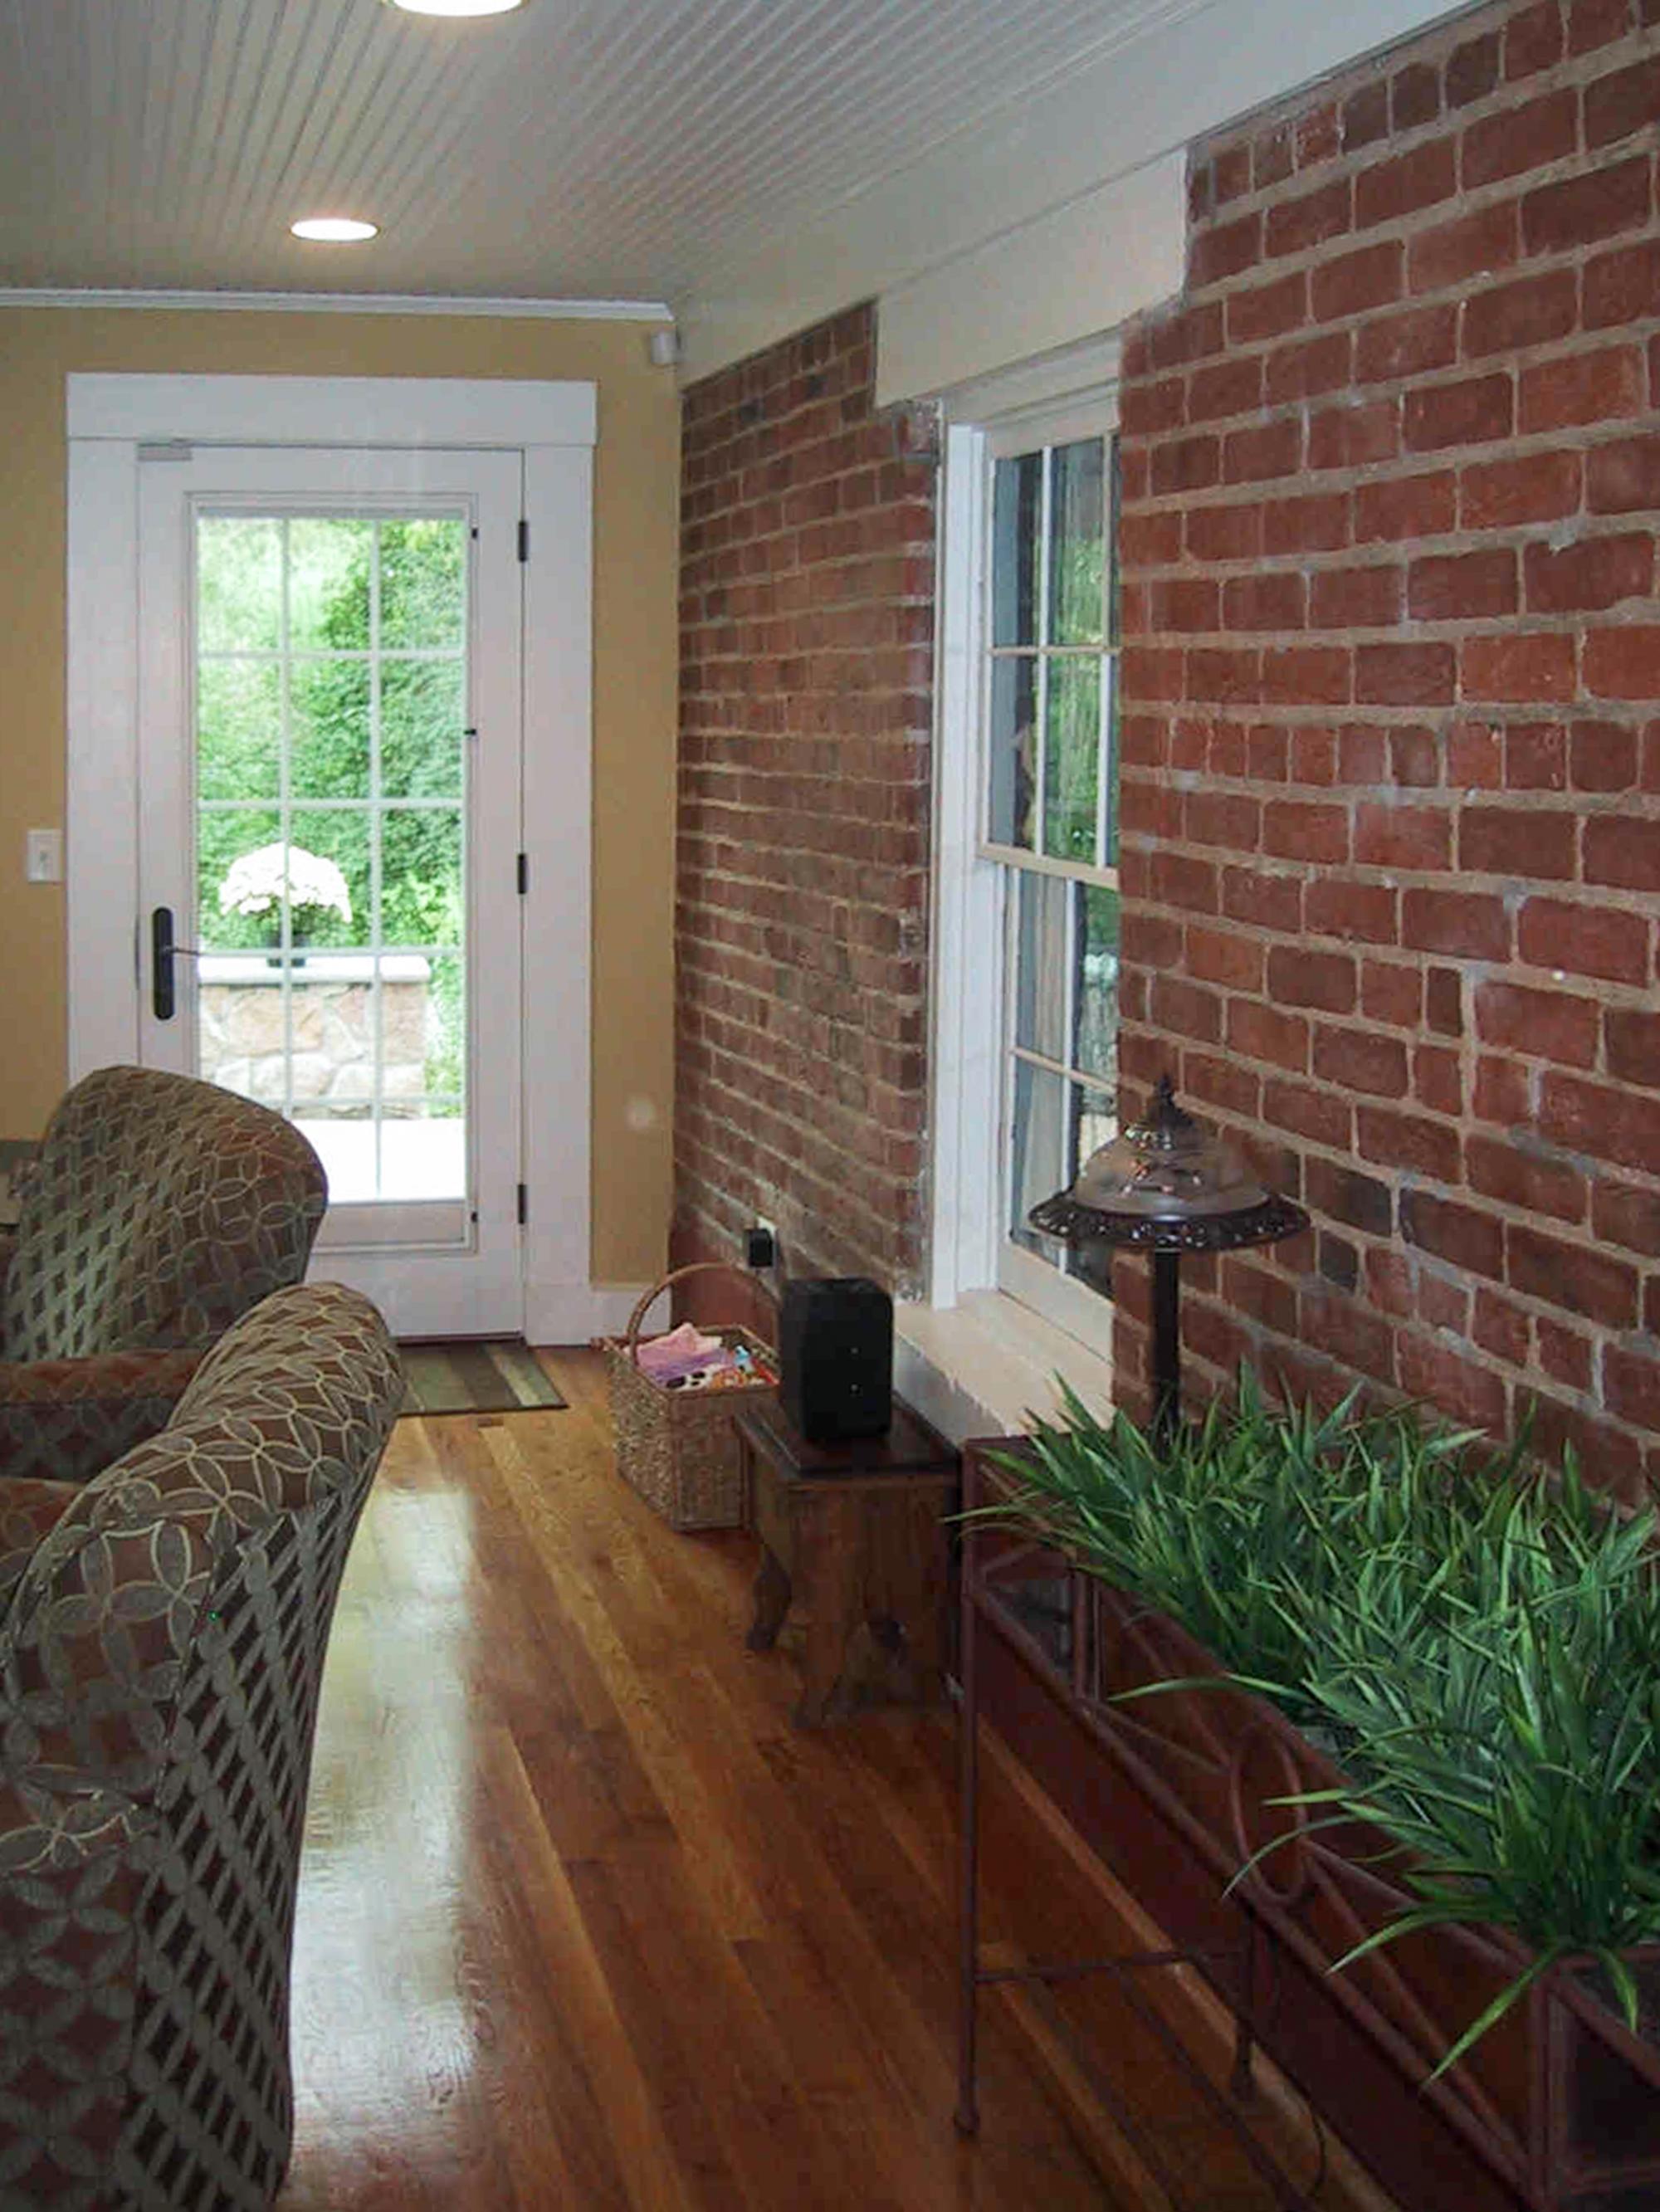 sunroom interior with exposed brick wall Wilcox Architecture